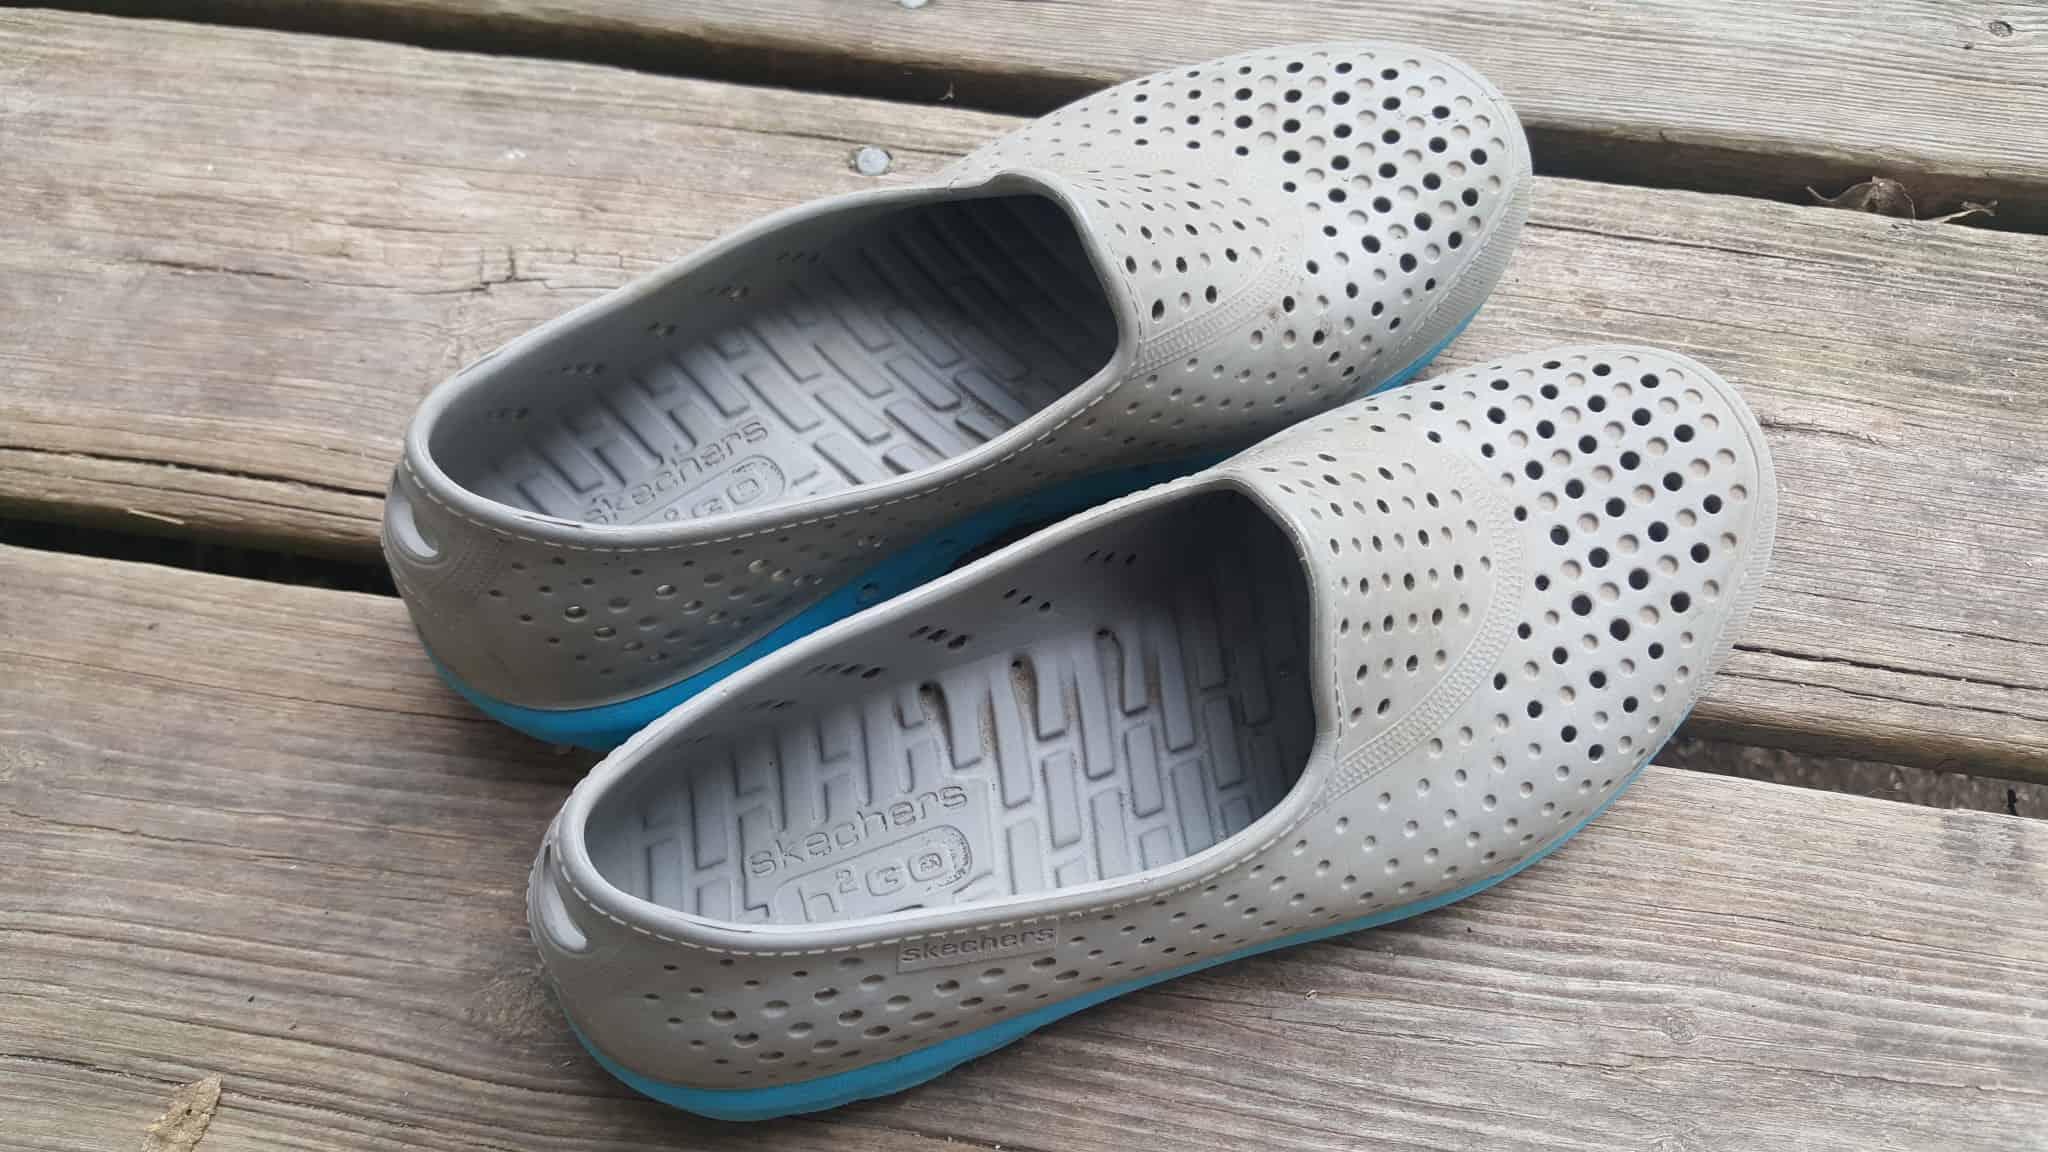 Skechers Waterproof Women's Shoes - H2GO